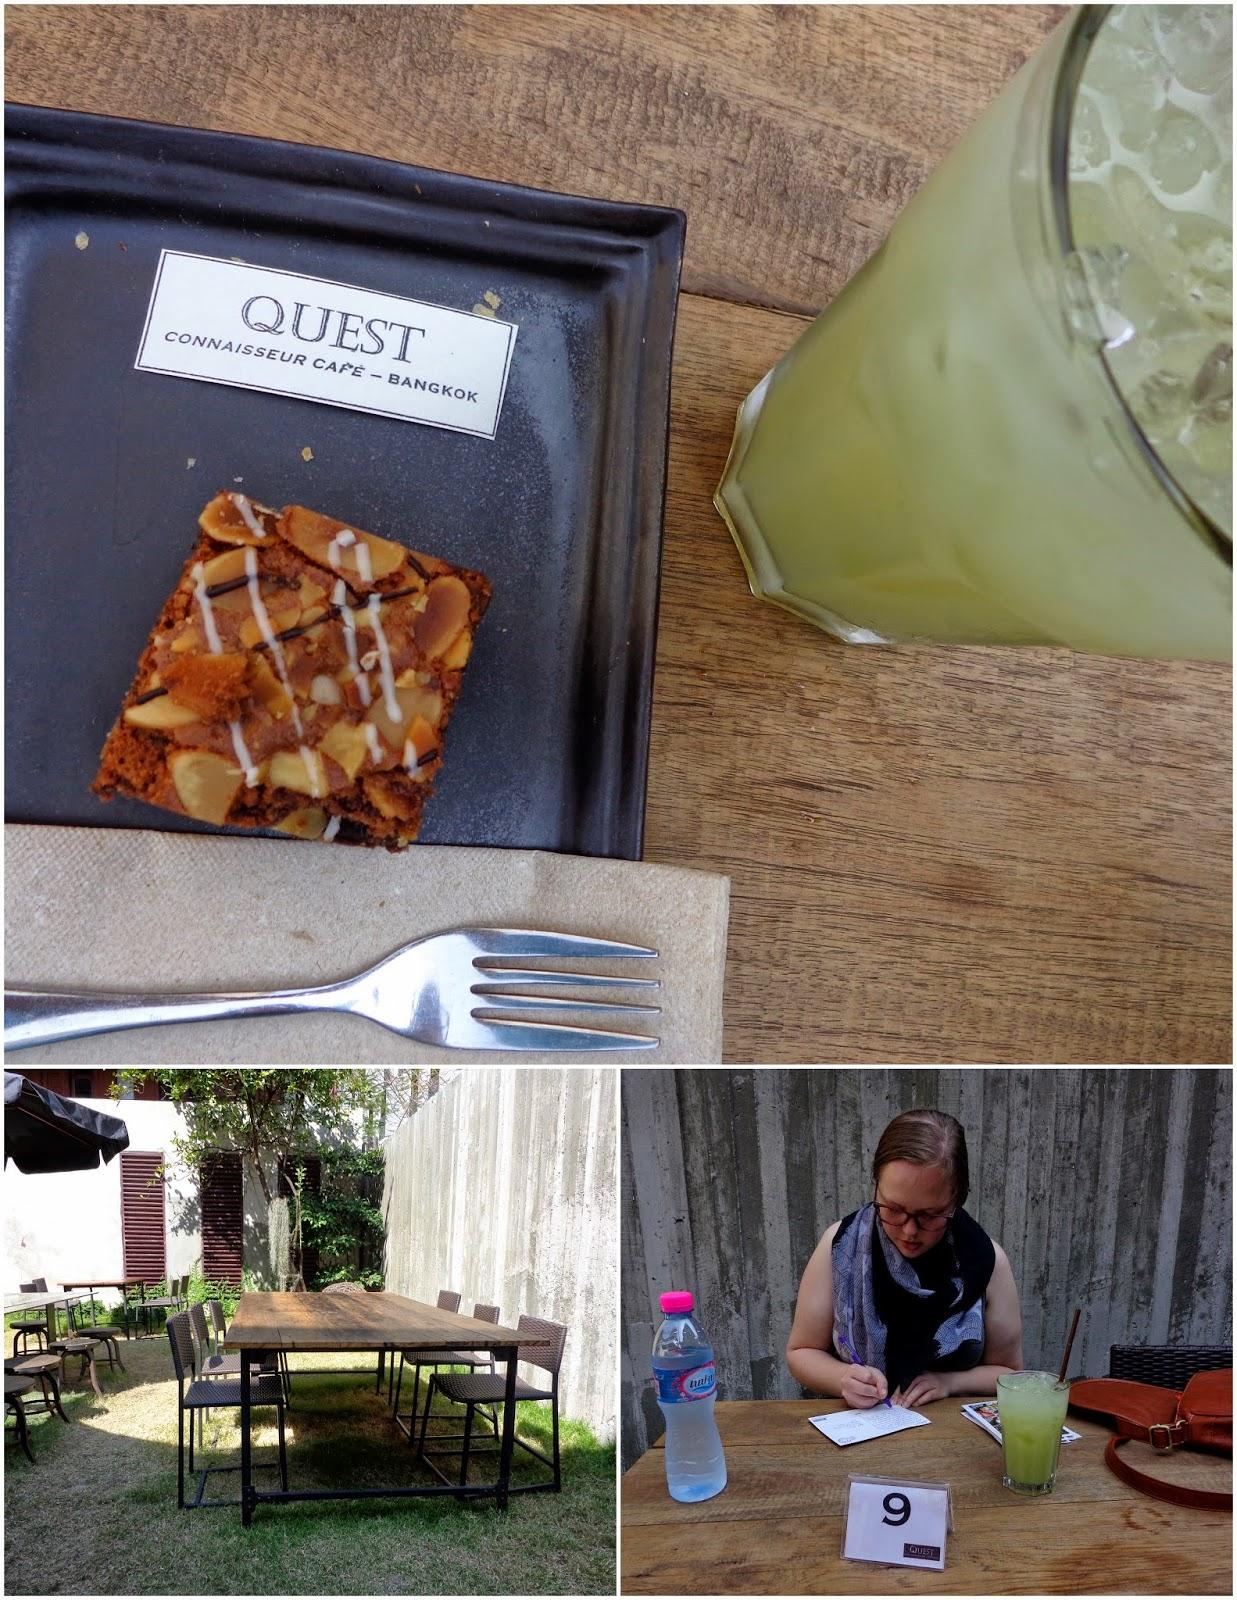 Bangkok-Quest-Connaisseur-Cafe